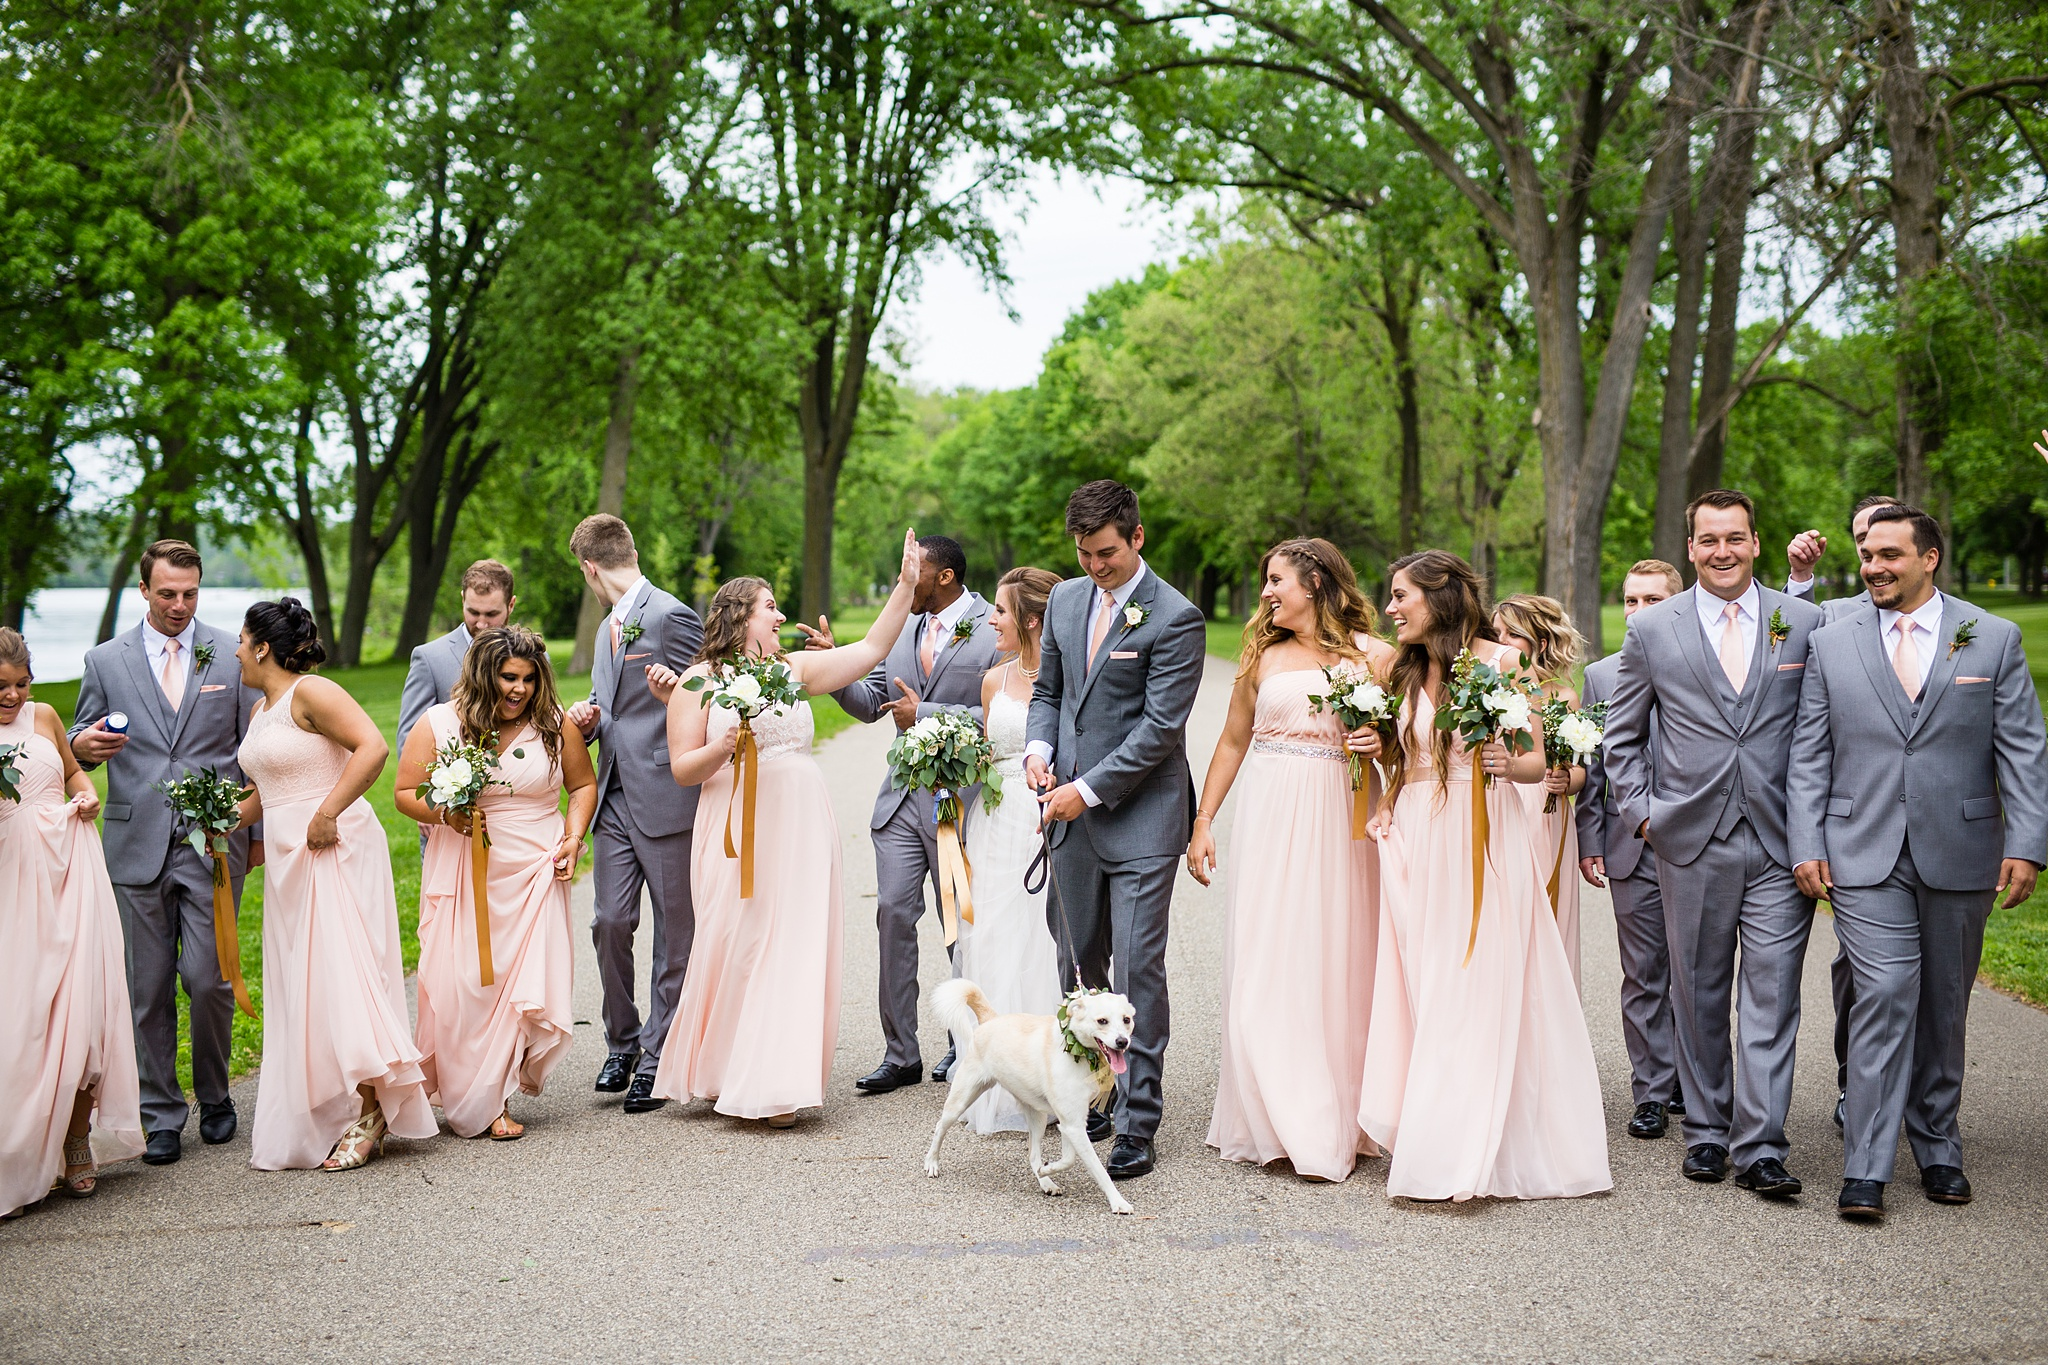 Meghan_Drew_Grand_Rapids_Cheney_place_Wedding065.JPG